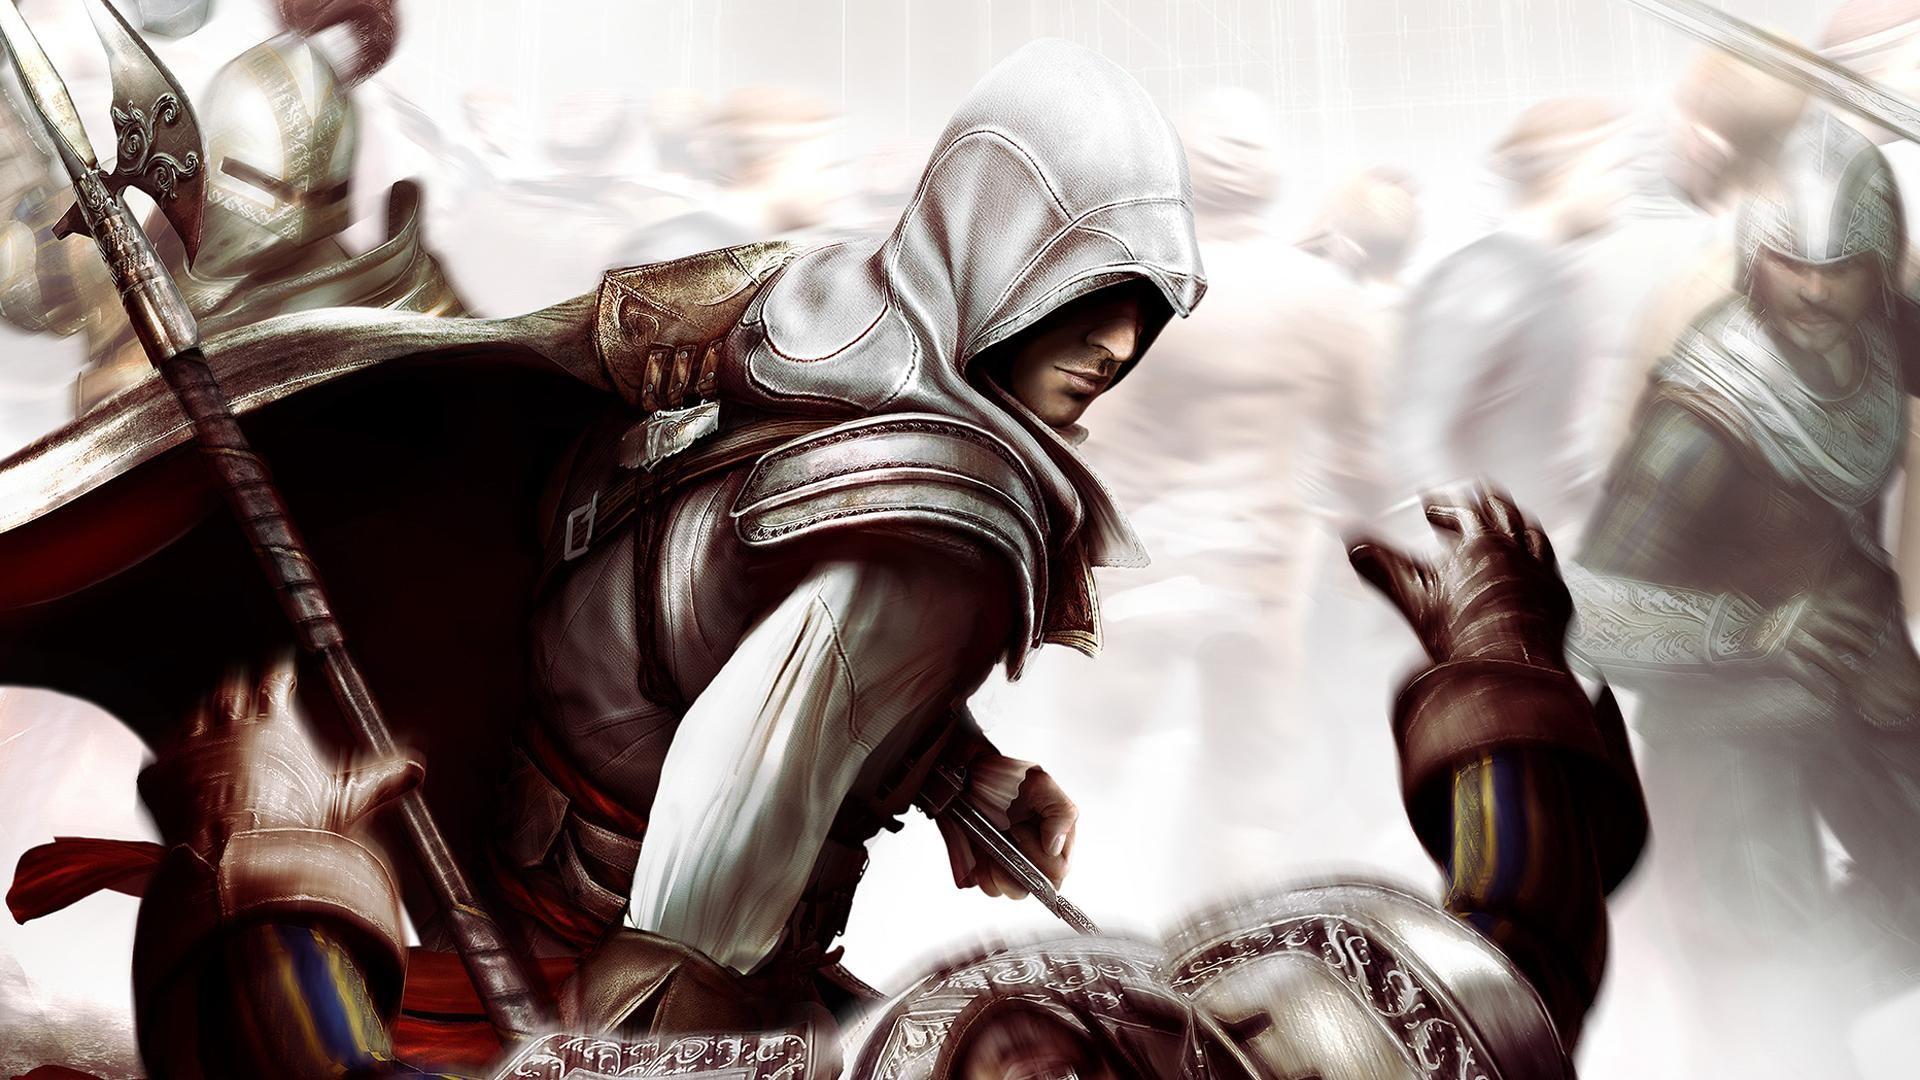 Assassin Creed 2 Wallpapers - Wallpaper Cave | Assassin's creed brotherhood, Assassins creed ii, Assassin's creed wallpaper